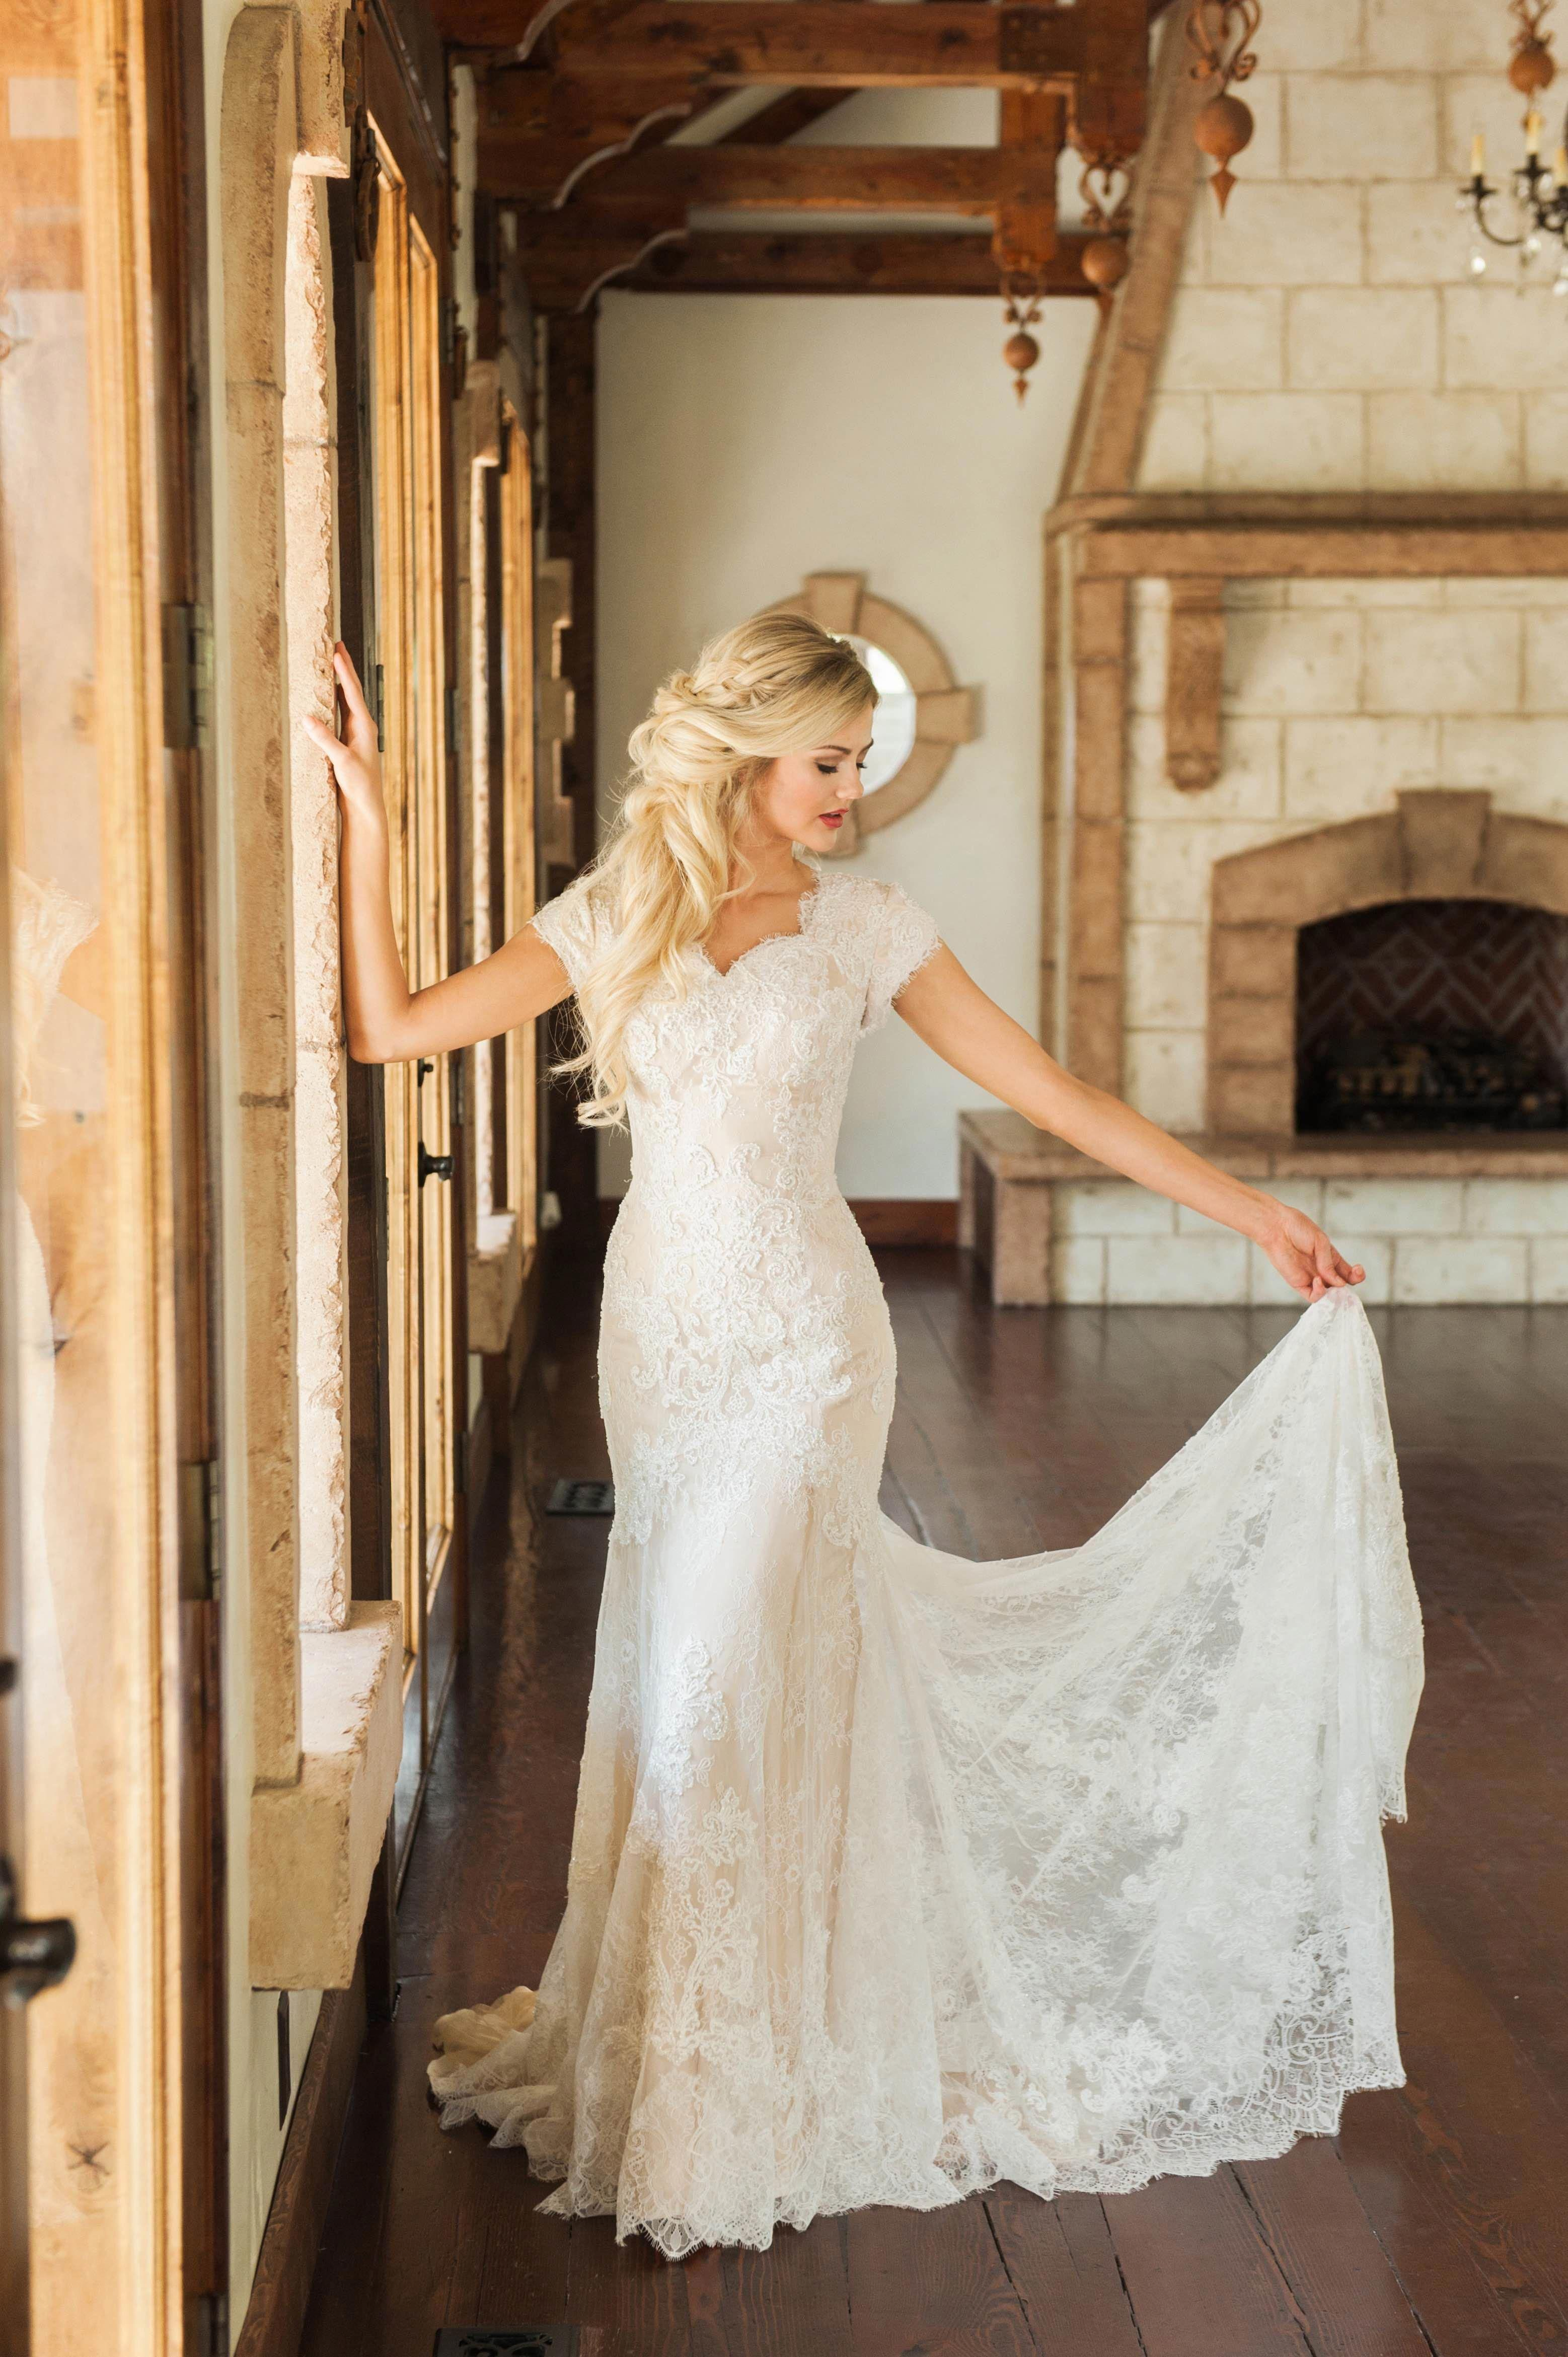 30 Modest Wedding Dresses Wedding dresses short